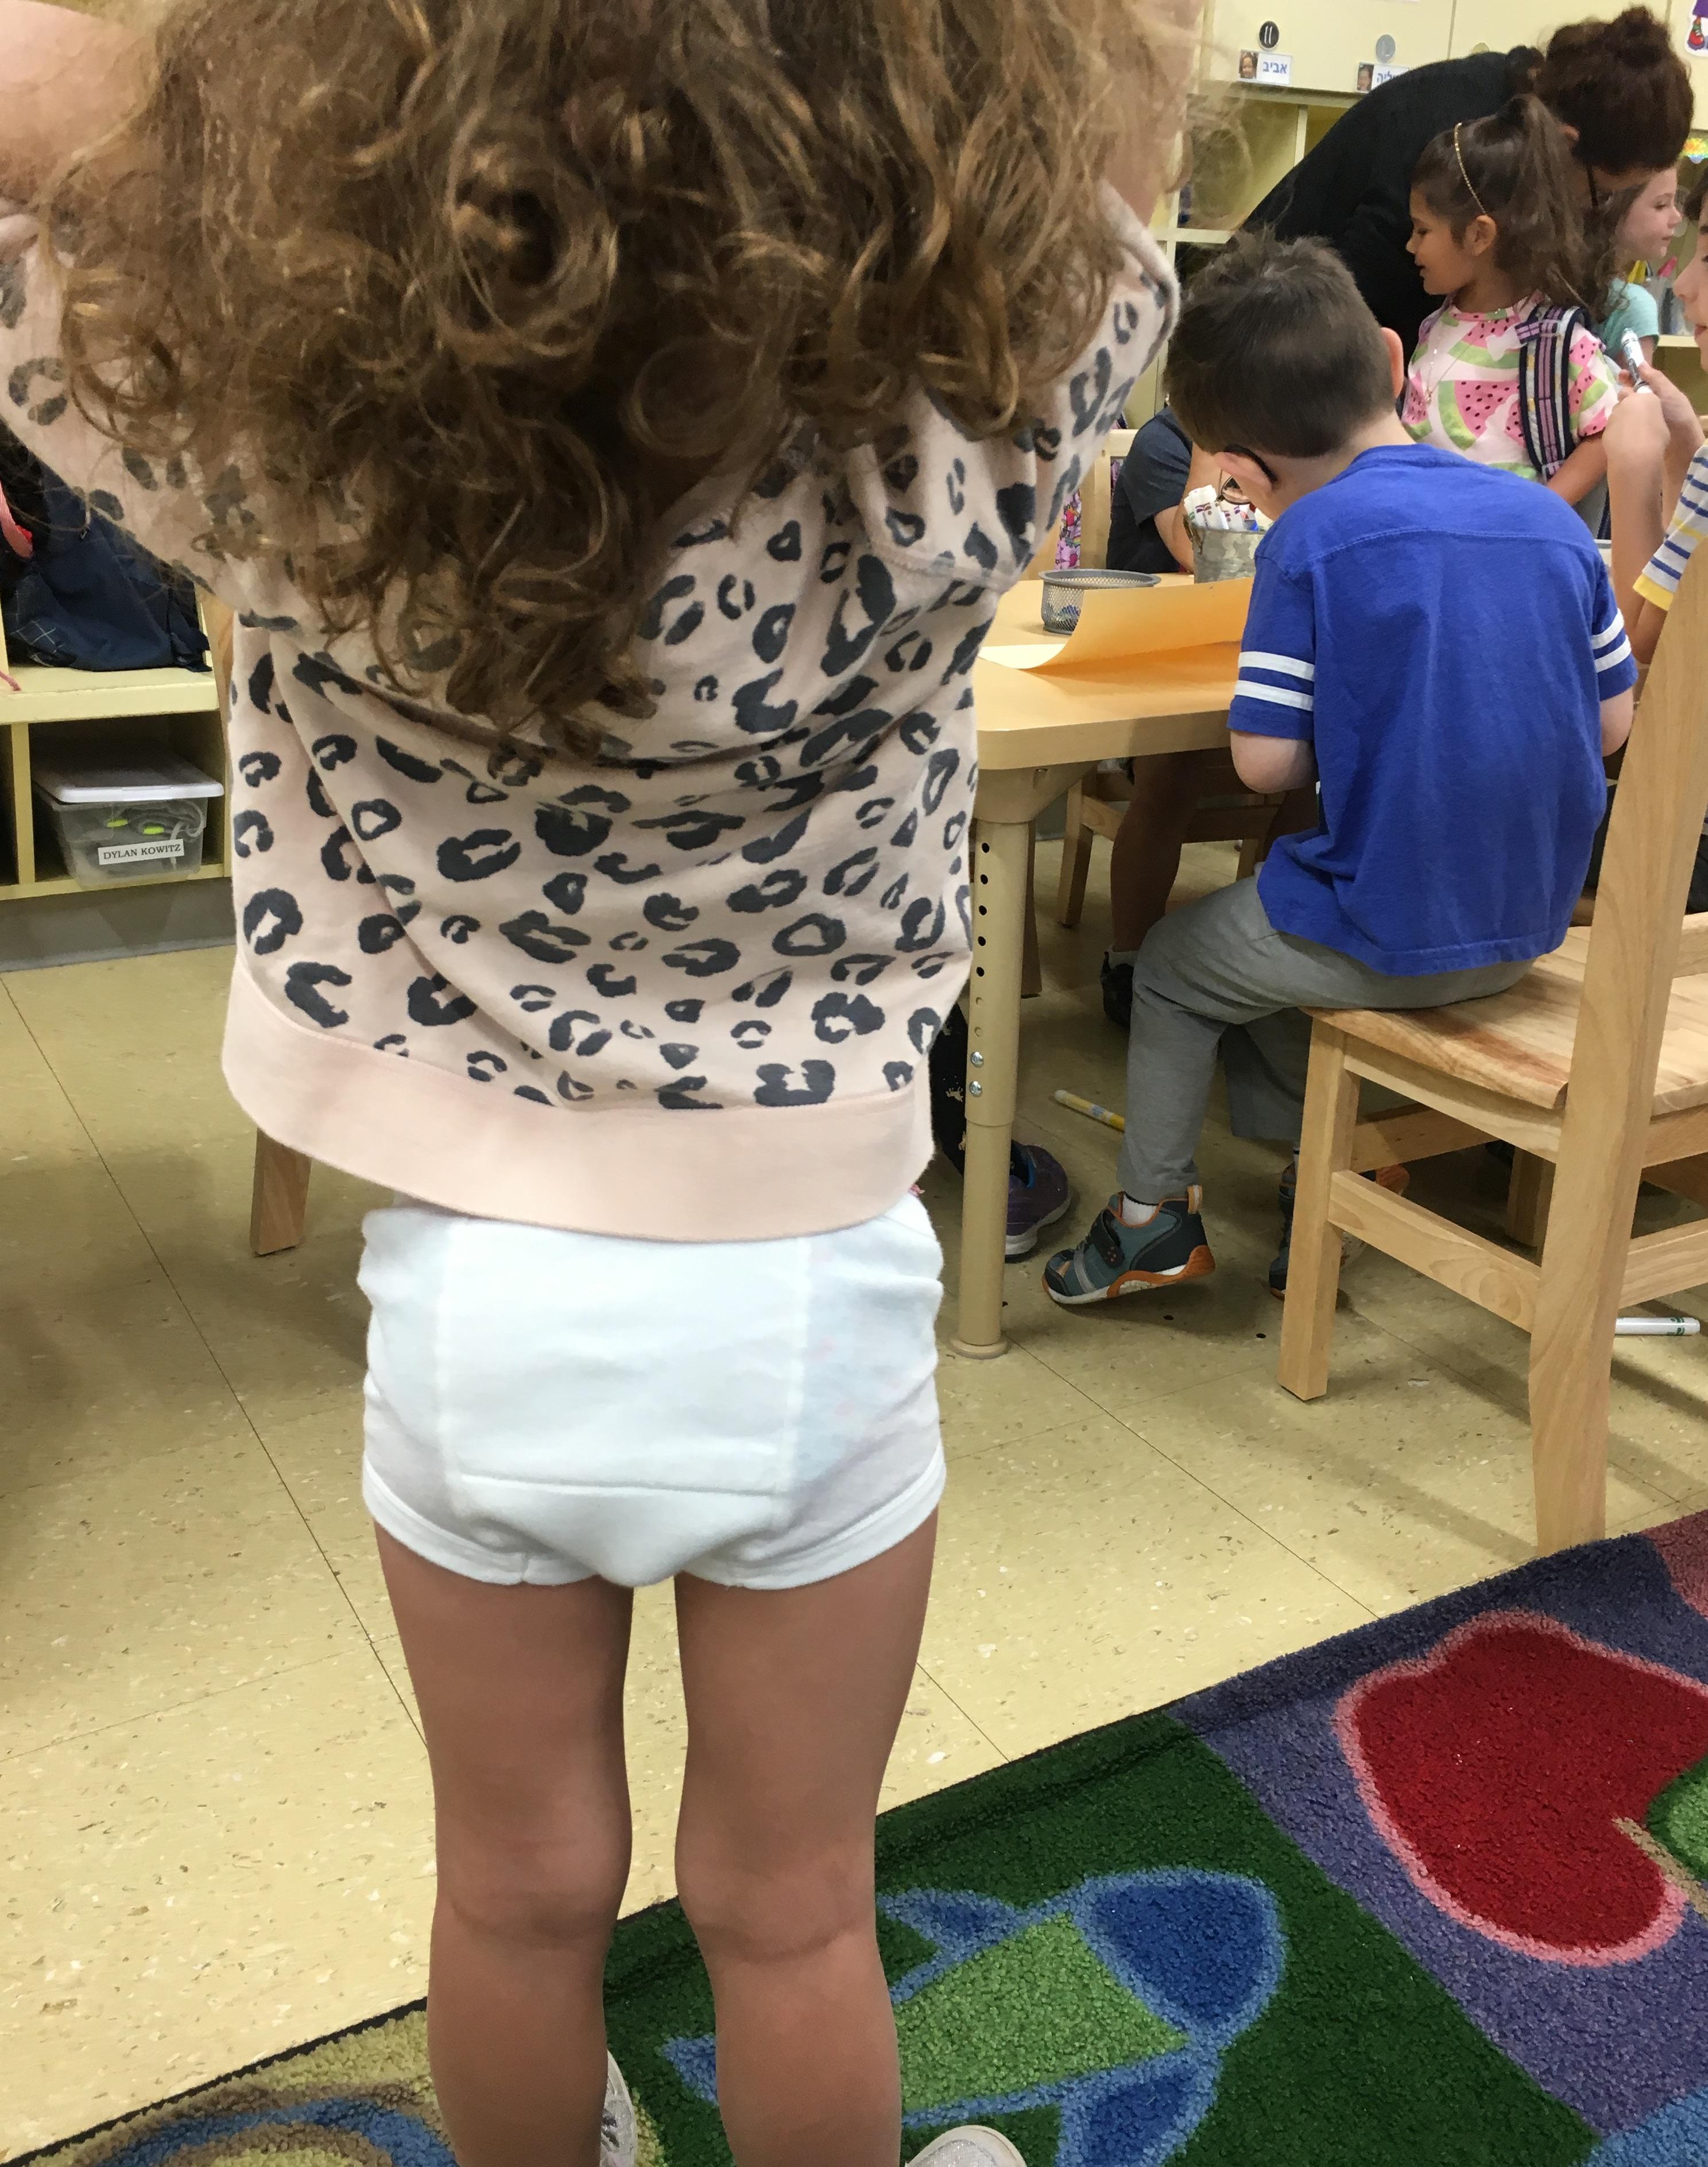 Dad Sends Preschool Daughter To Class Dressed In Underwear